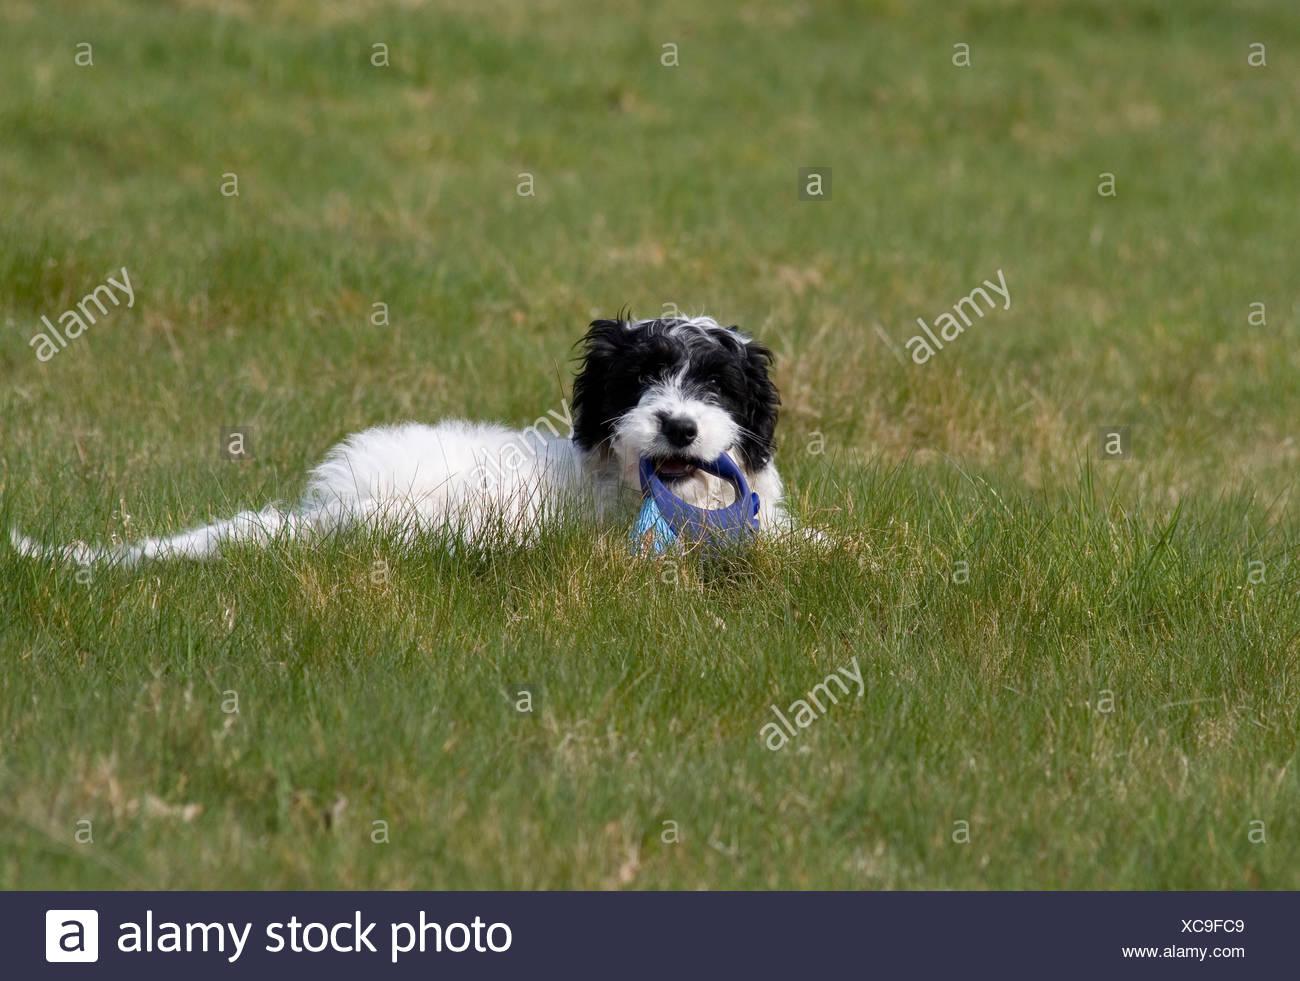 portrait cockerpoo puppy sitting in field - Stock Image